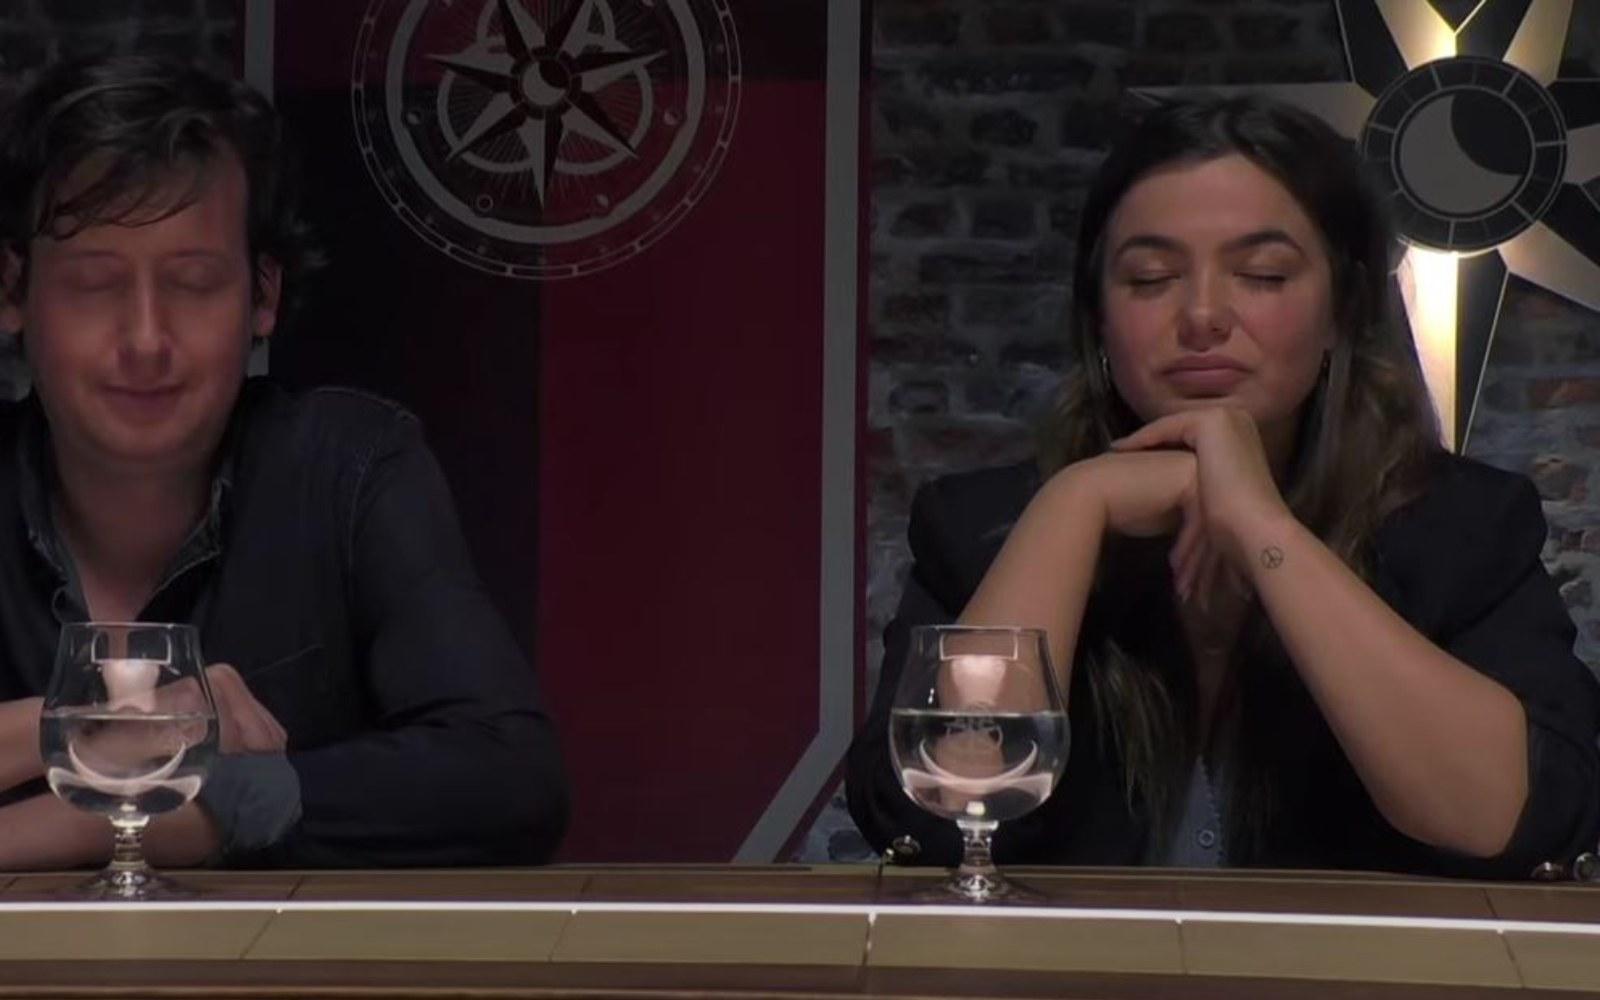 Abbey Hoes De Verraders deelnemers RTL 4 ogen dicht